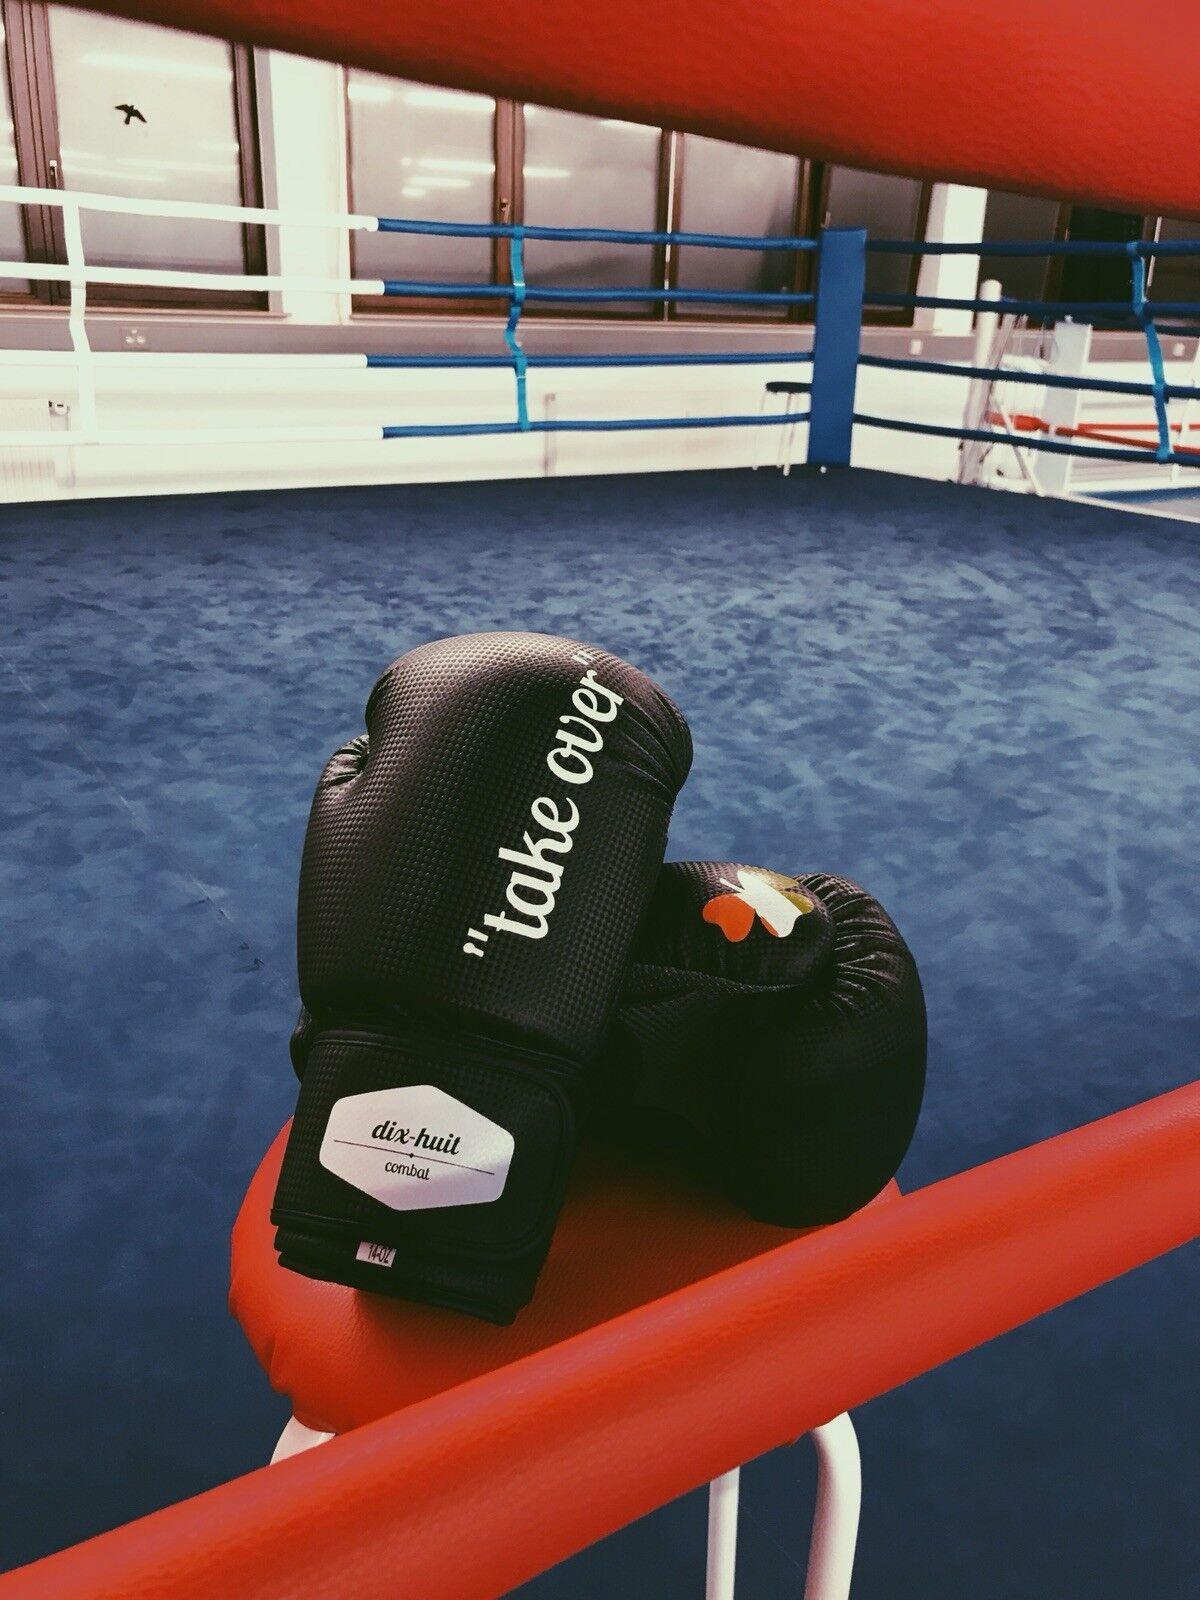 Boxhandschuhe dixhuit combat Mc Gregor fighting Irish mma mma mma 10 oz 12 Oz 14 Oz 13d9d9